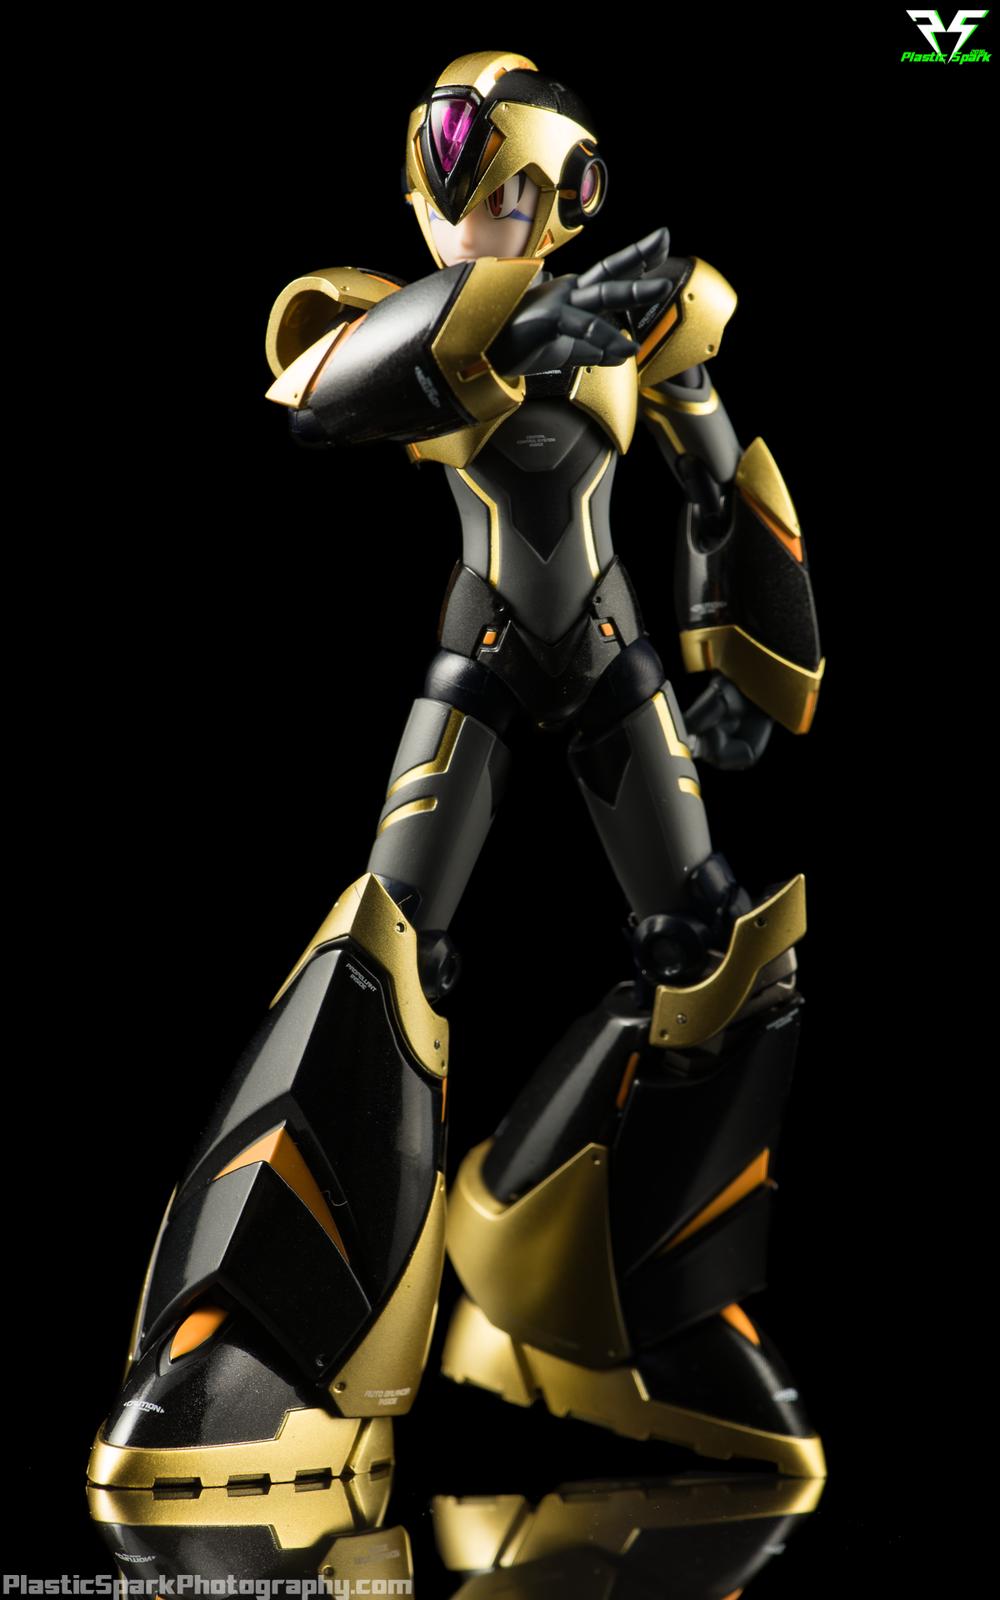 Truforce-Megaman-X-Kai-(10-of-12).png